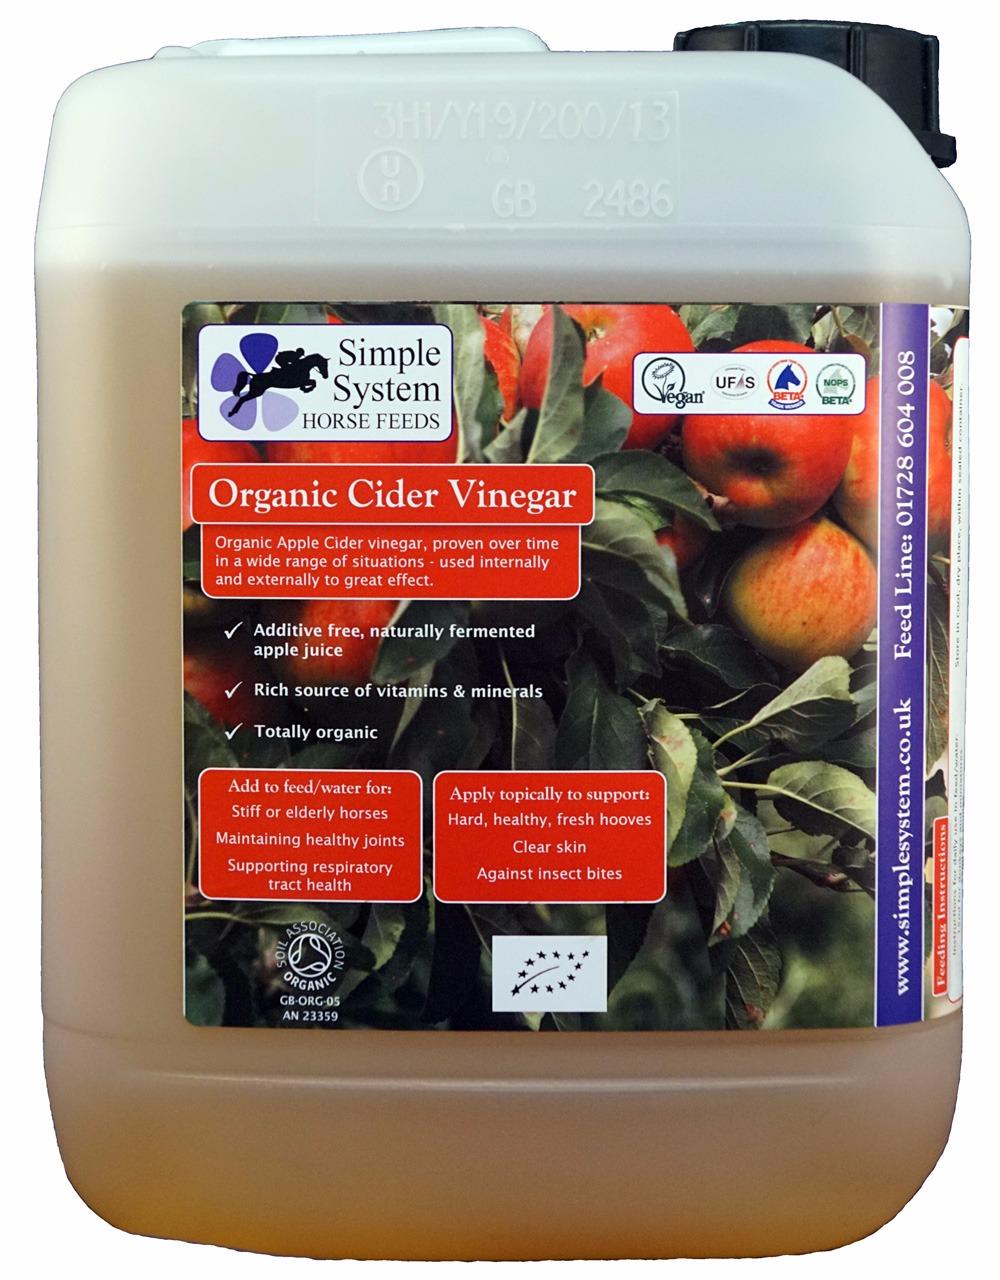 Simple System Organic Cider Vinegar